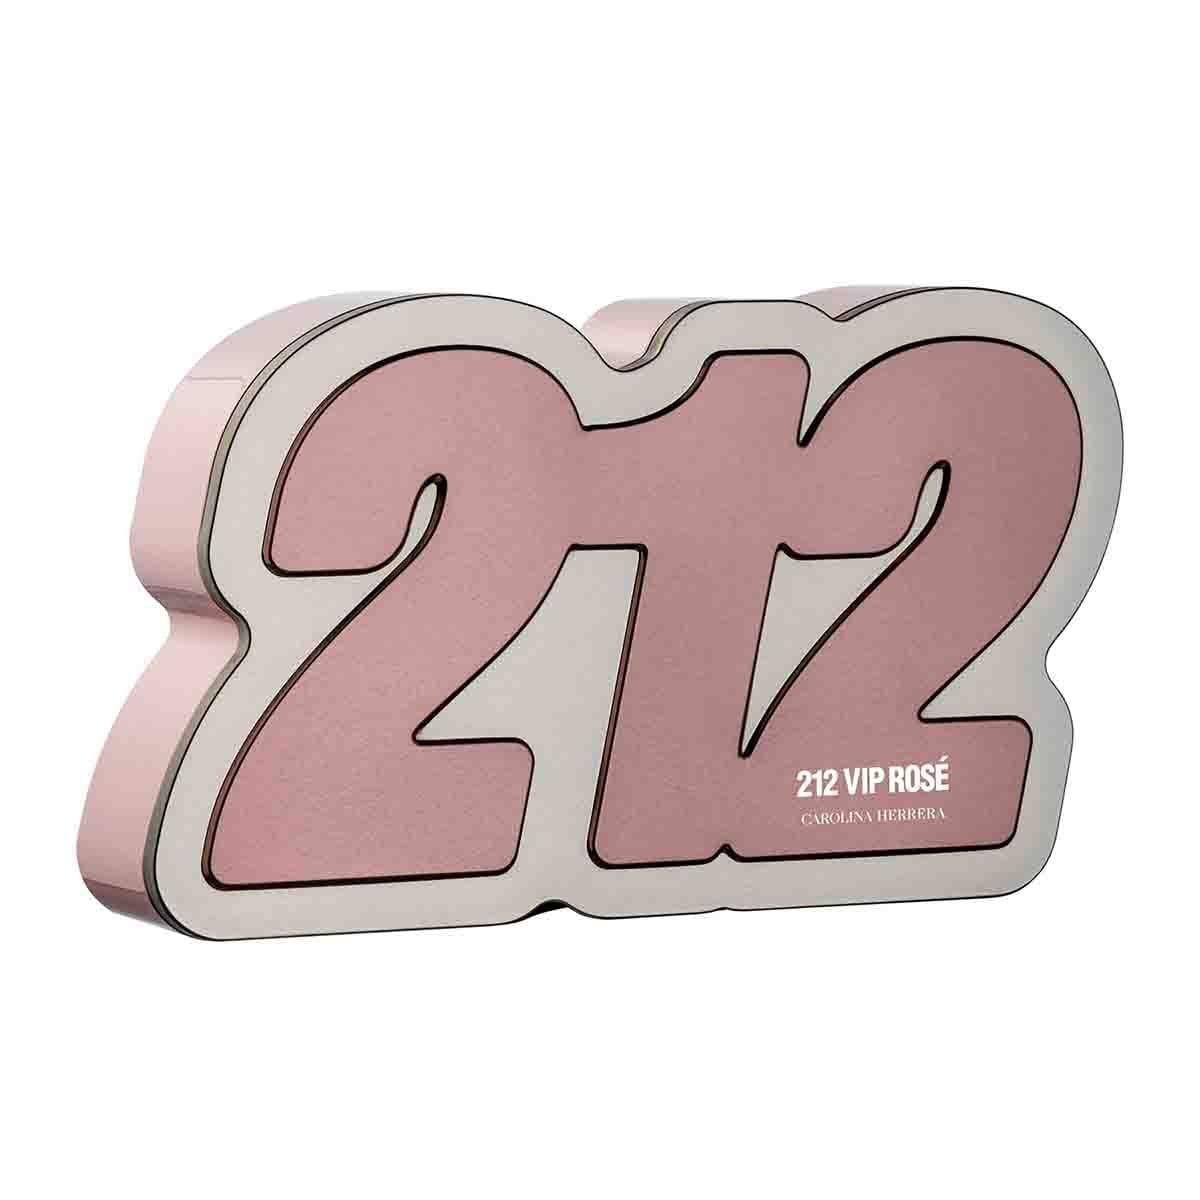 Estuche para Dama Carolina Herrera 212 Vip Rosé Edp 80 Ml + Body Lotion 100 Ml